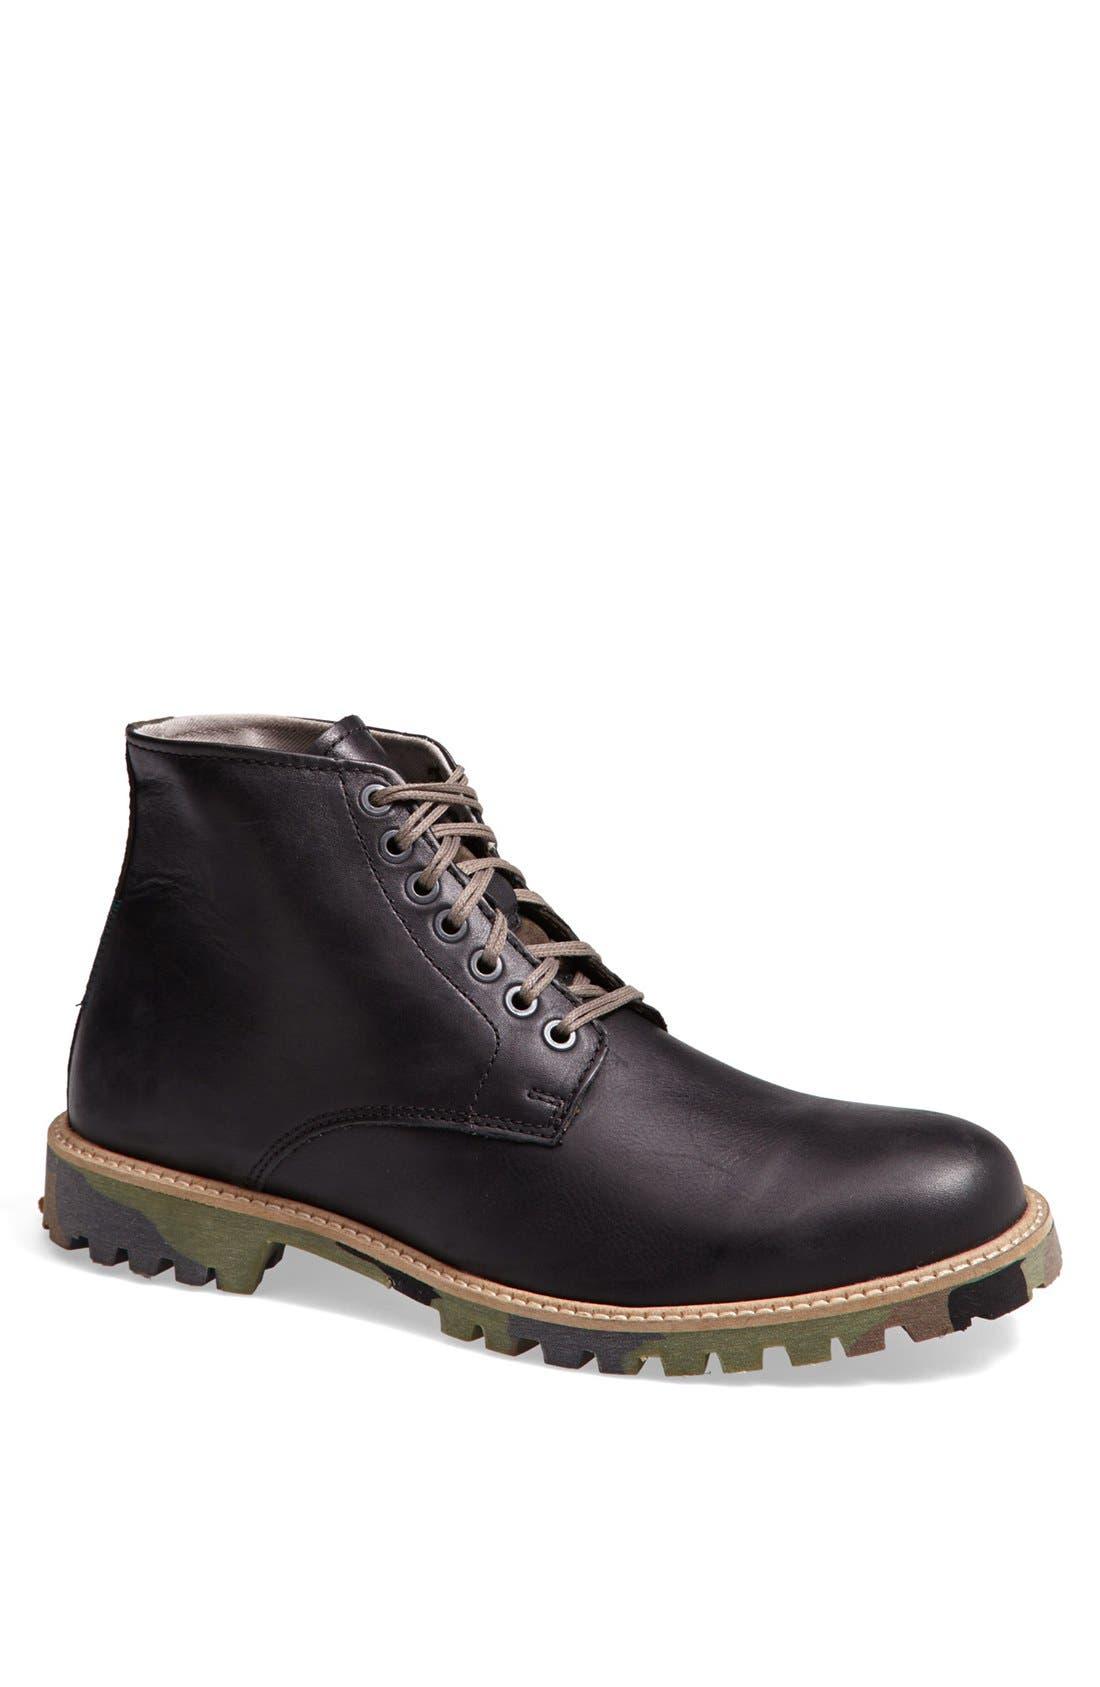 ALDO 'Cetuur' Plain Toe Boot, Main, color, 002